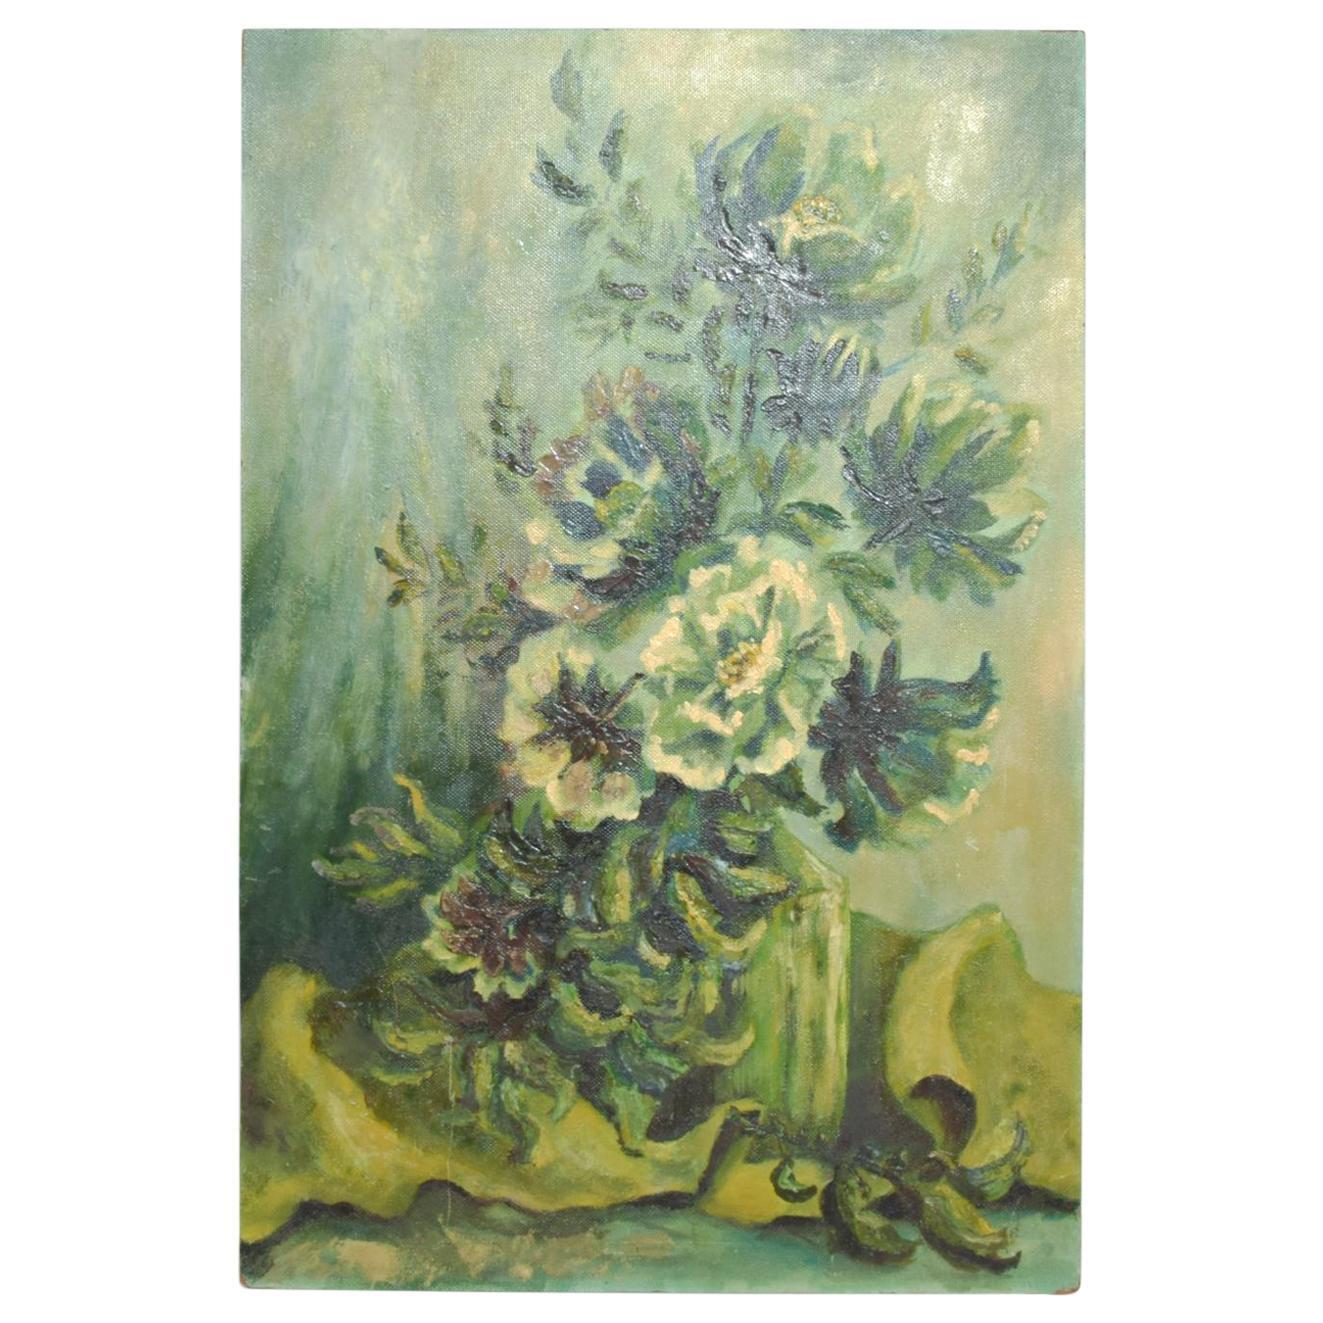 Vintage Oil Painting Still Life Green Floral Midcentury Art on Masonite